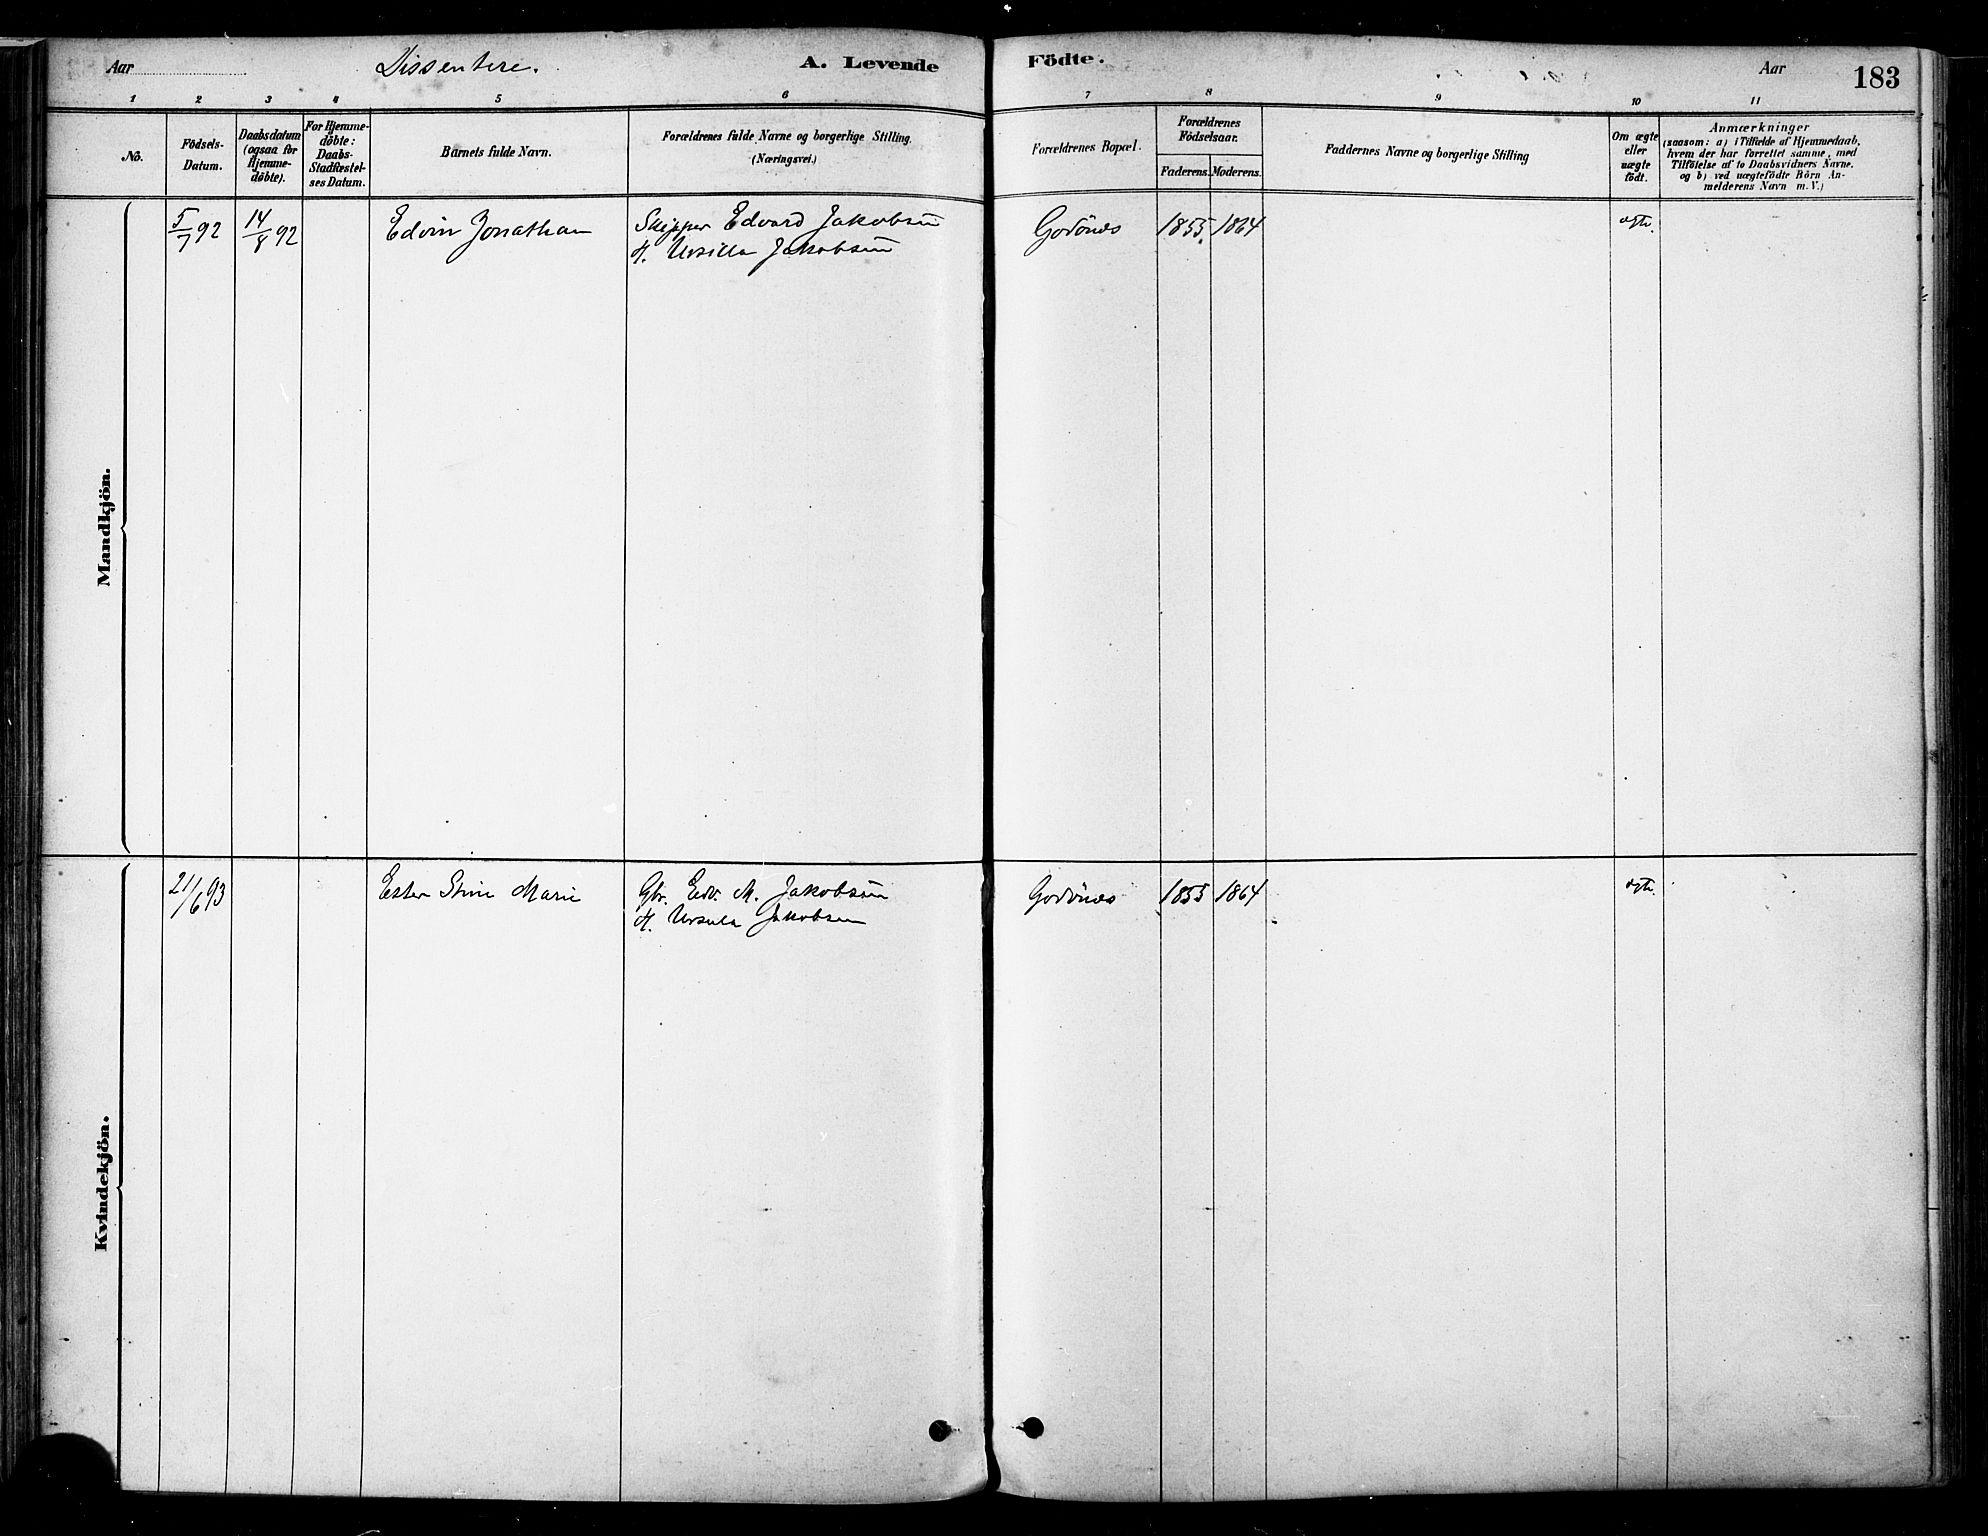 SAT, Ministerialprotokoller, klokkerbøker og fødselsregistre - Nordland, 802/L0054: Ministerialbok nr. 802A01, 1879-1893, s. 183